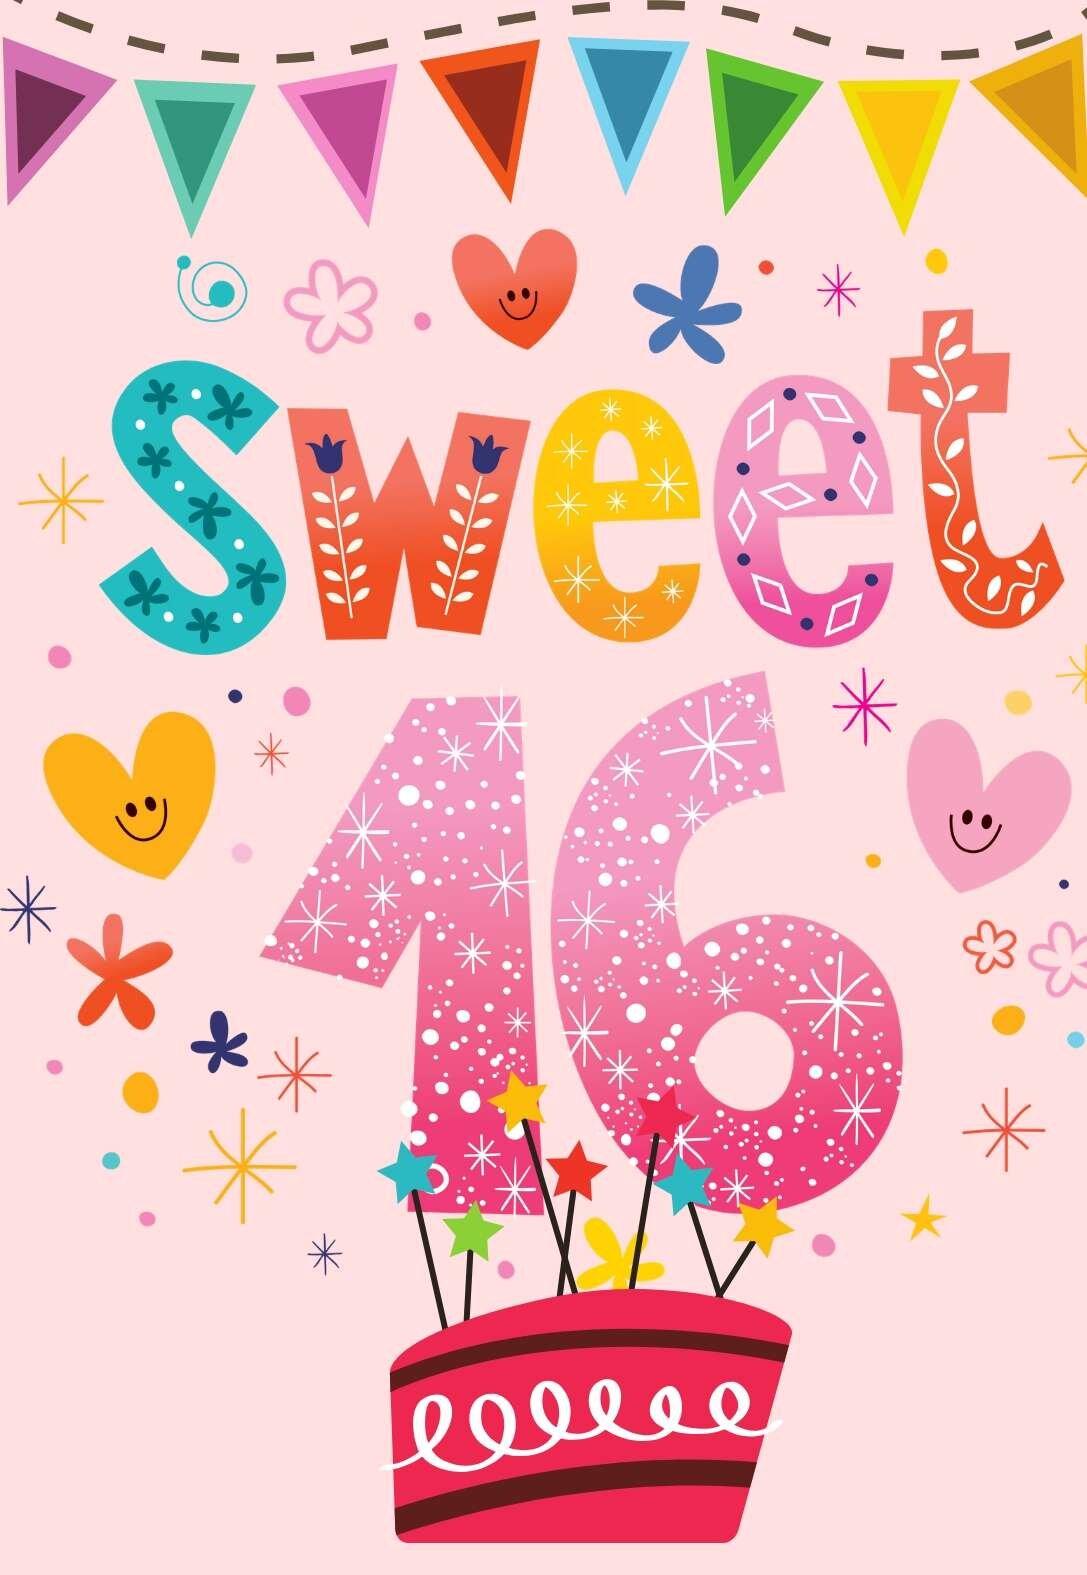 Sweet 16 16 Year Old Birthday Cards Printbirthday Cards